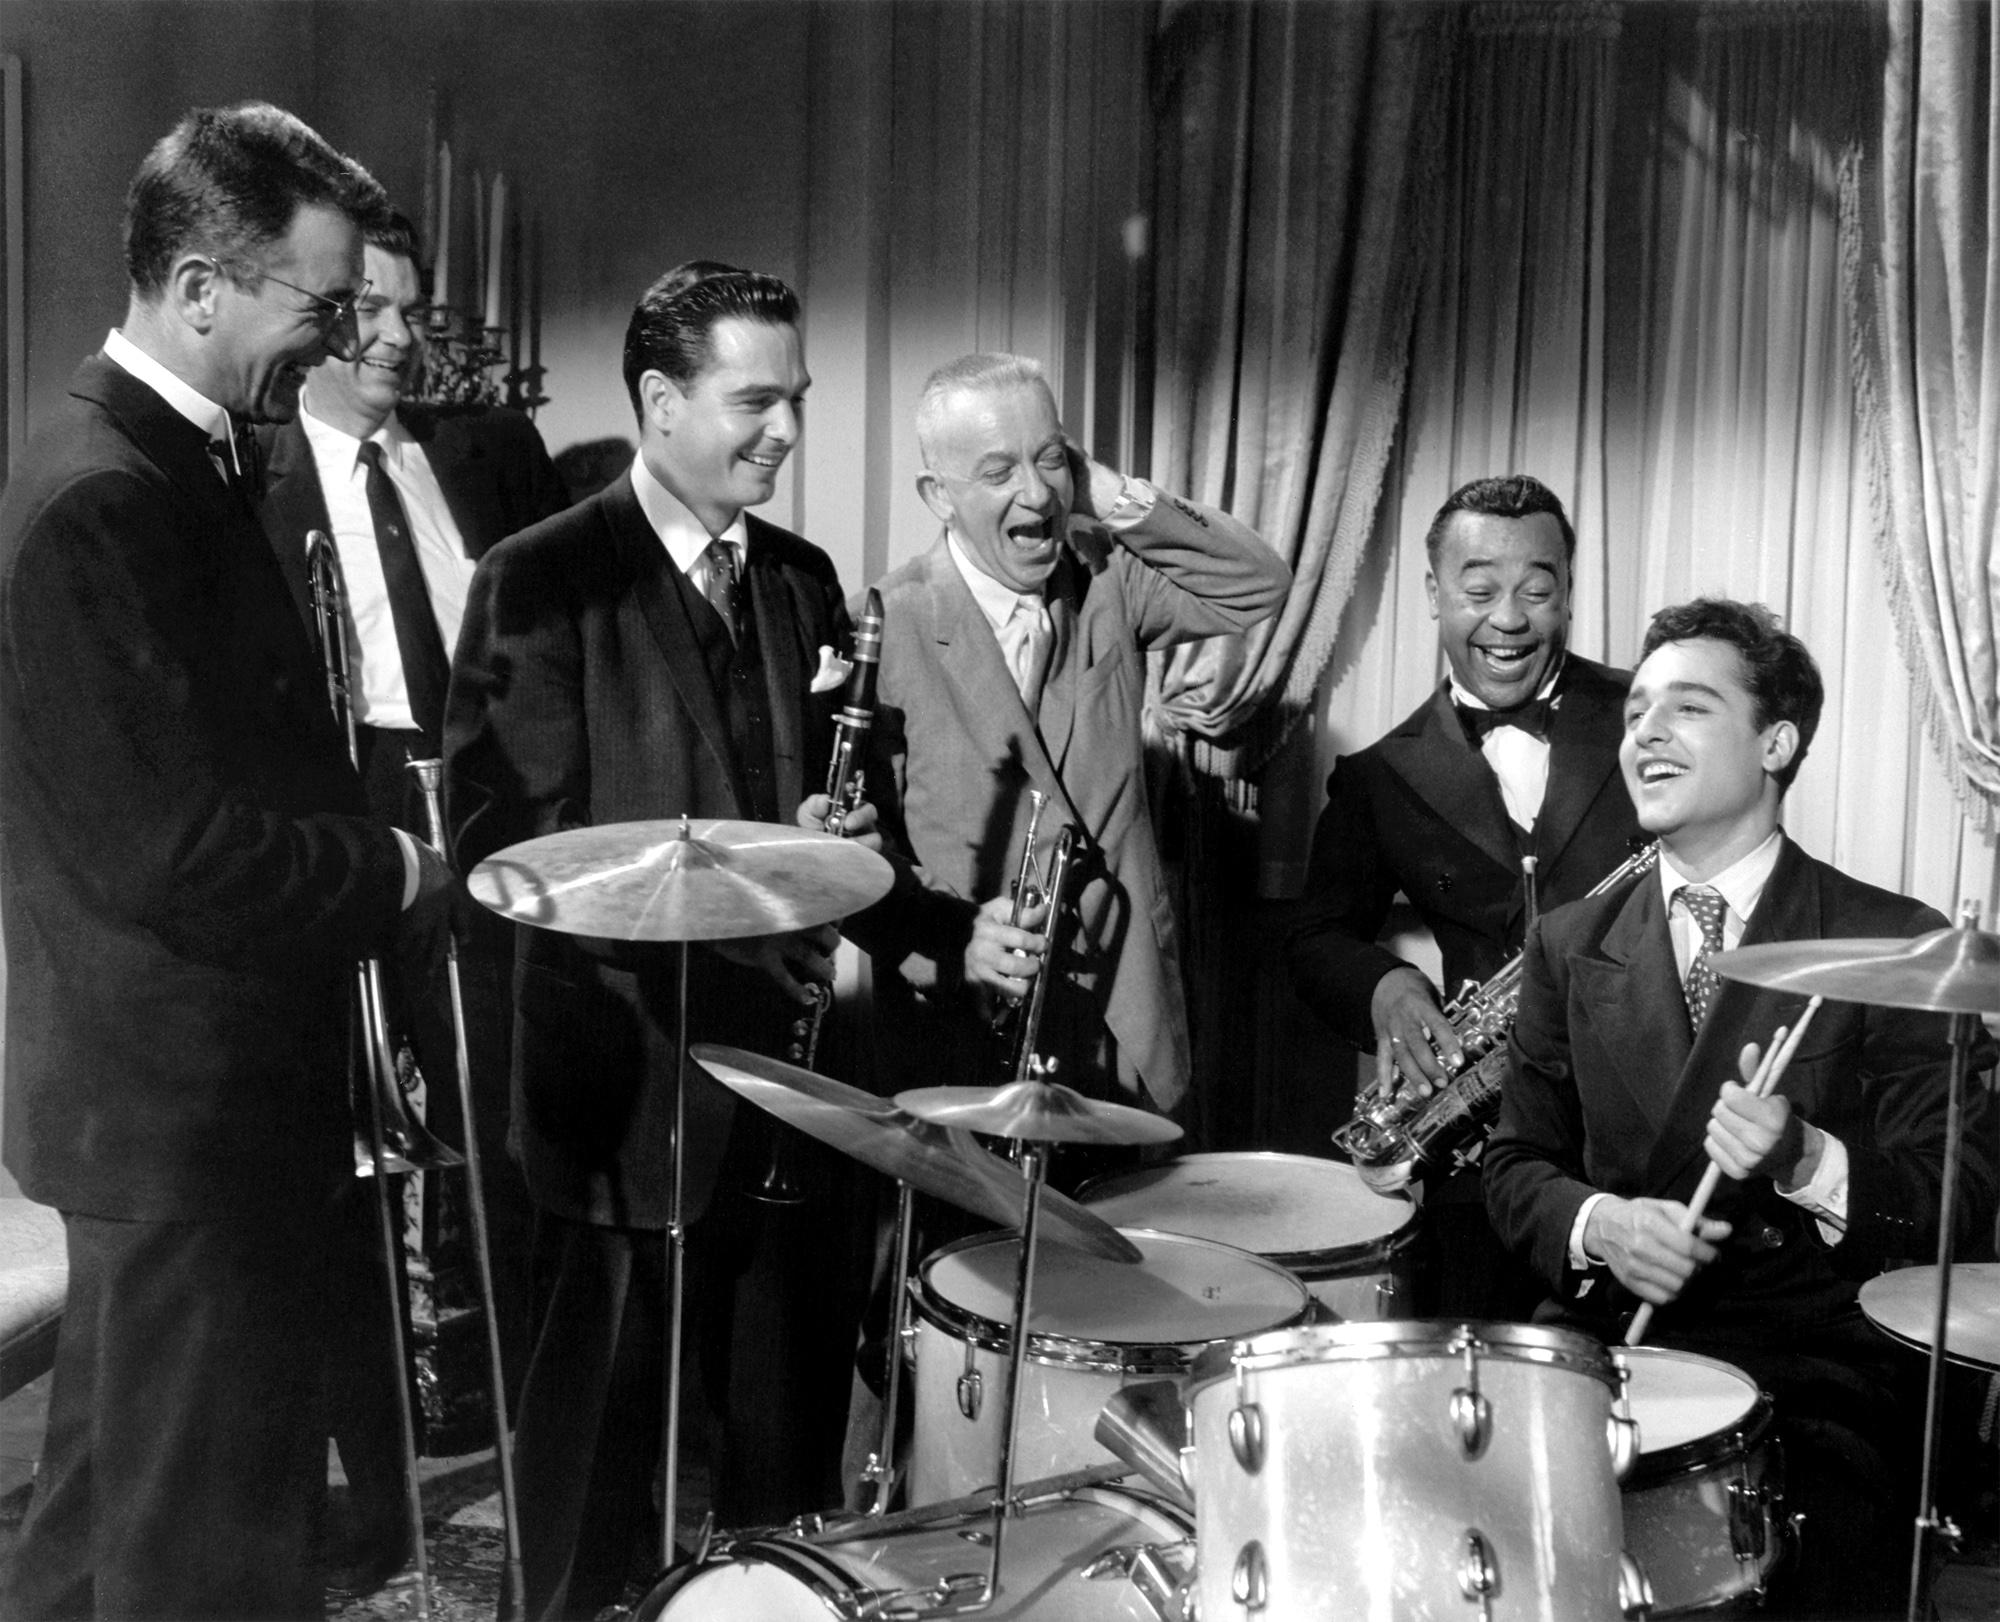 Gene Krupa And His Orchestra - Never Felt Better Never Had Less - Do You Wanna Jump Children